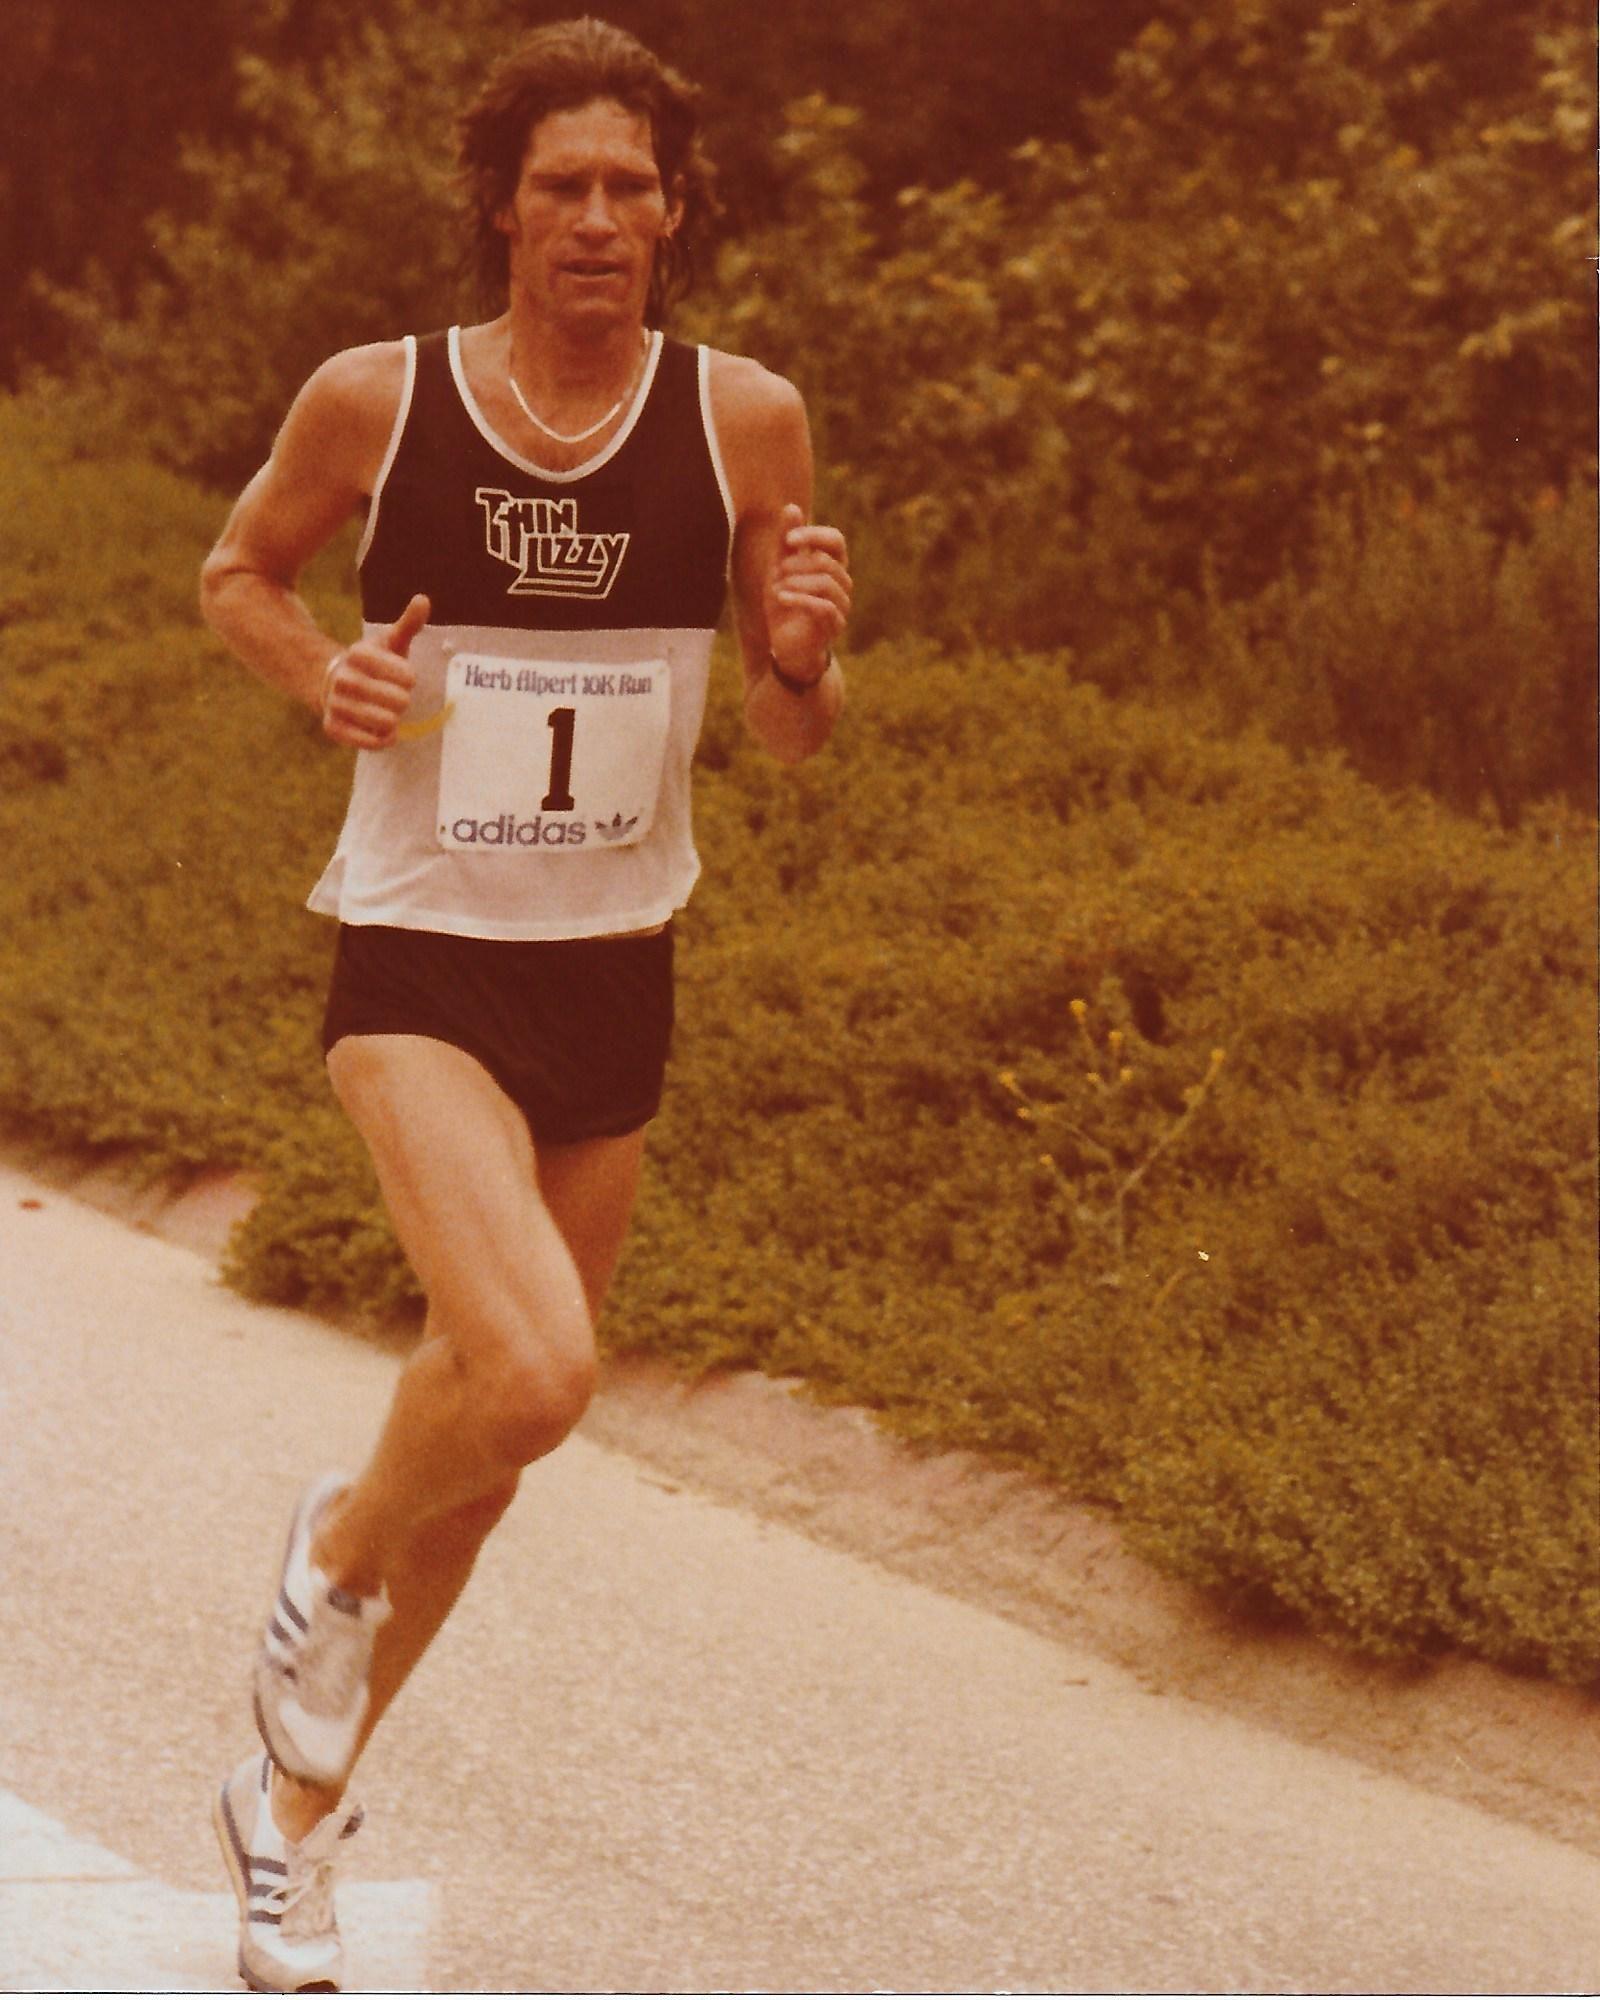 Jon Sutherland Thin Lizzy jersey